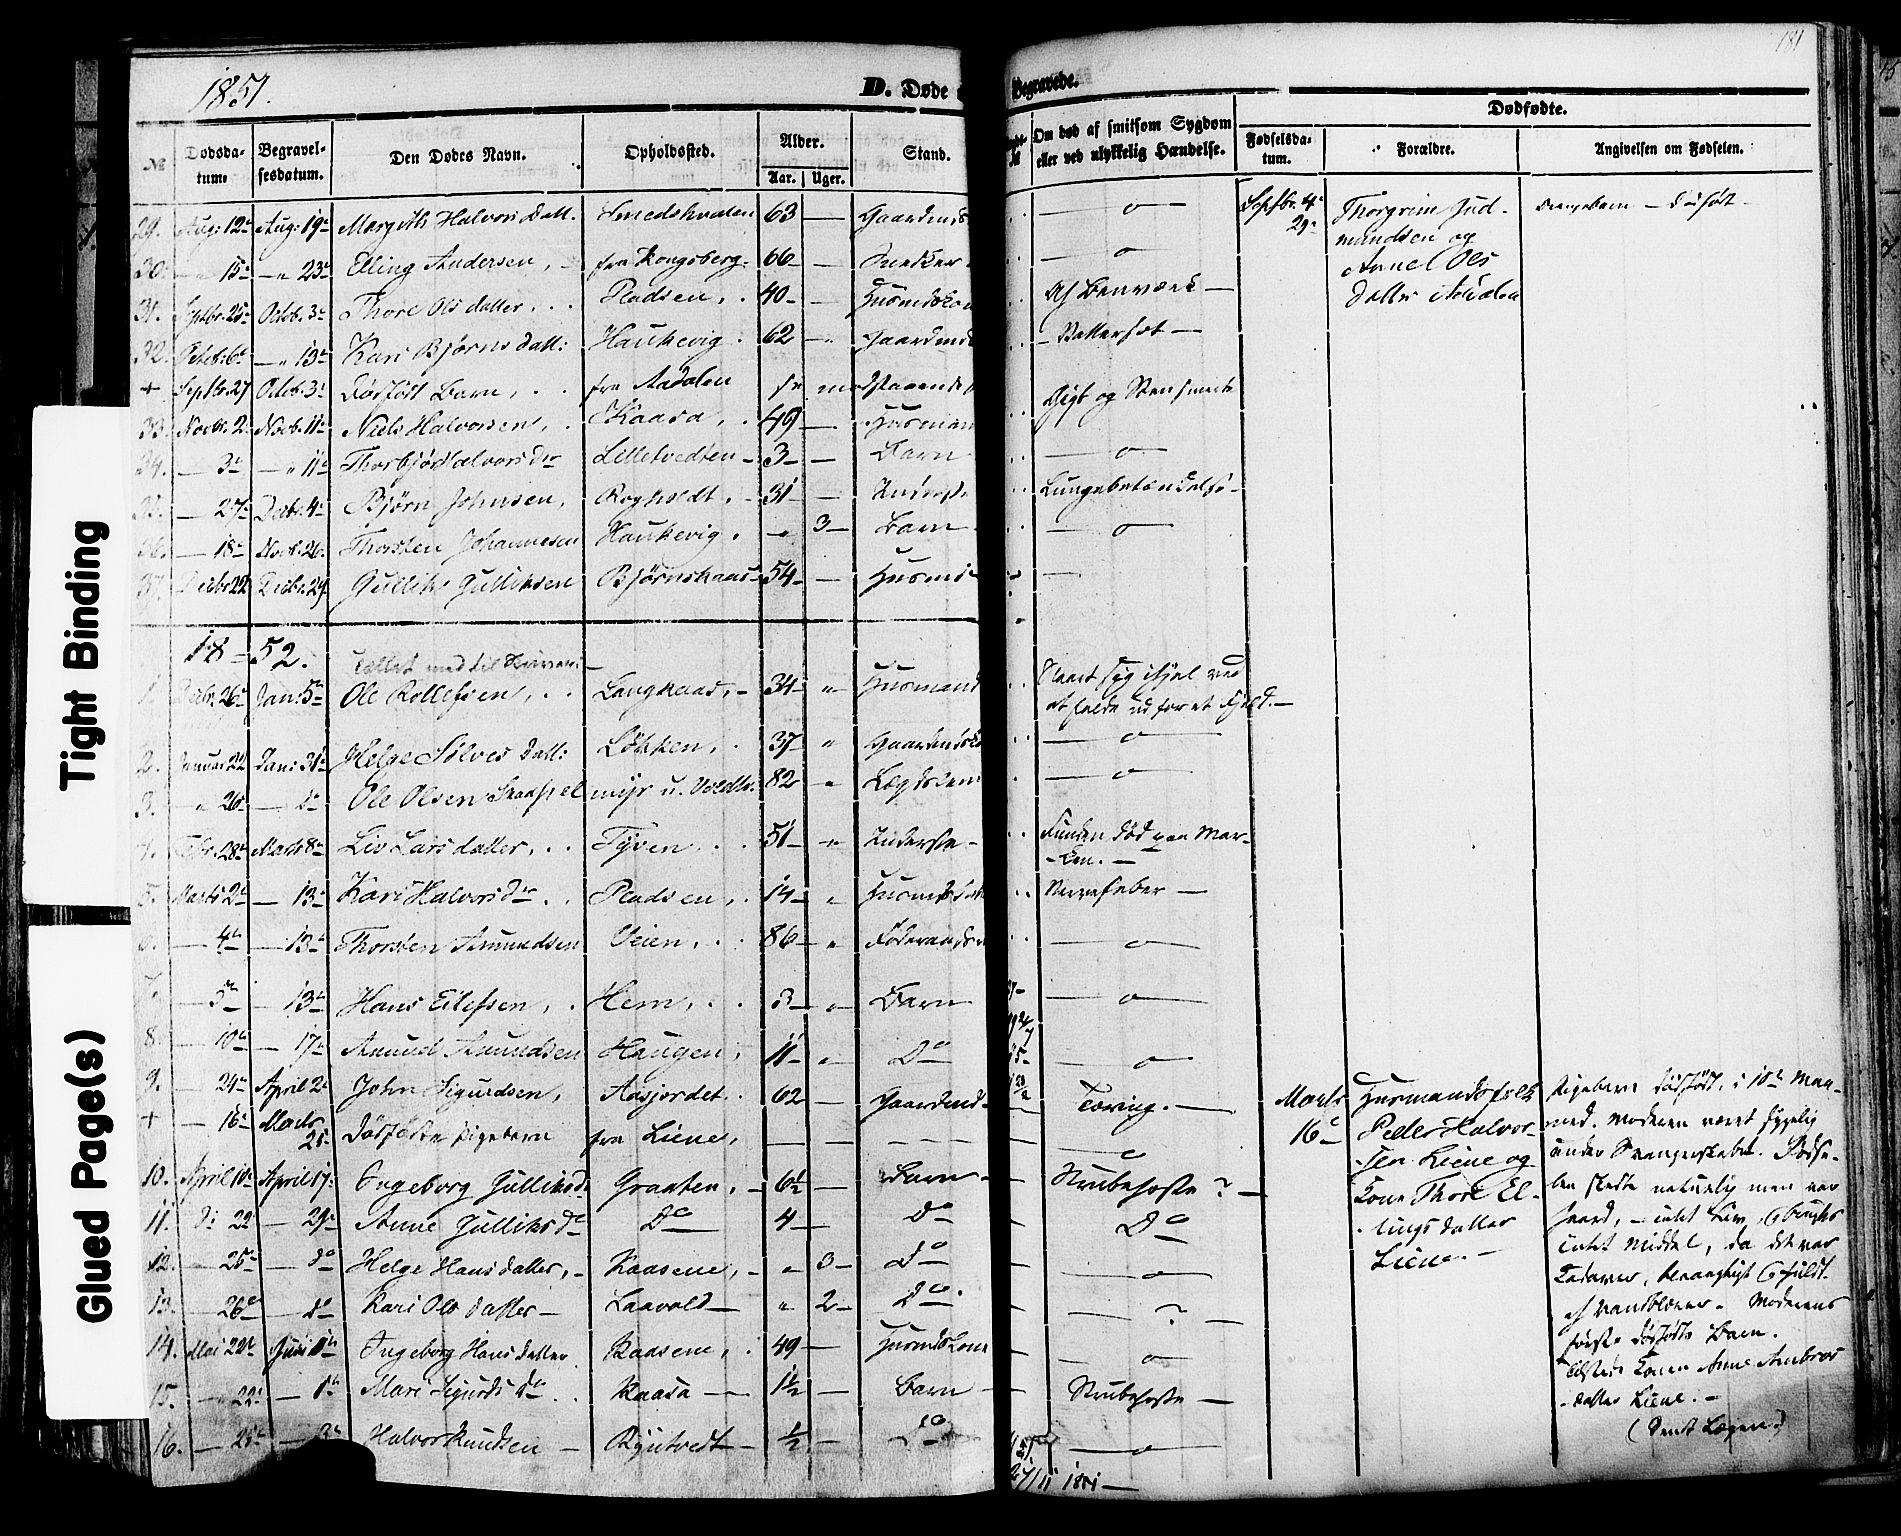 SAKO, Sauherad kirkebøker, F/Fa/L0007: Ministerialbok nr. I 7, 1851-1873, s. 181